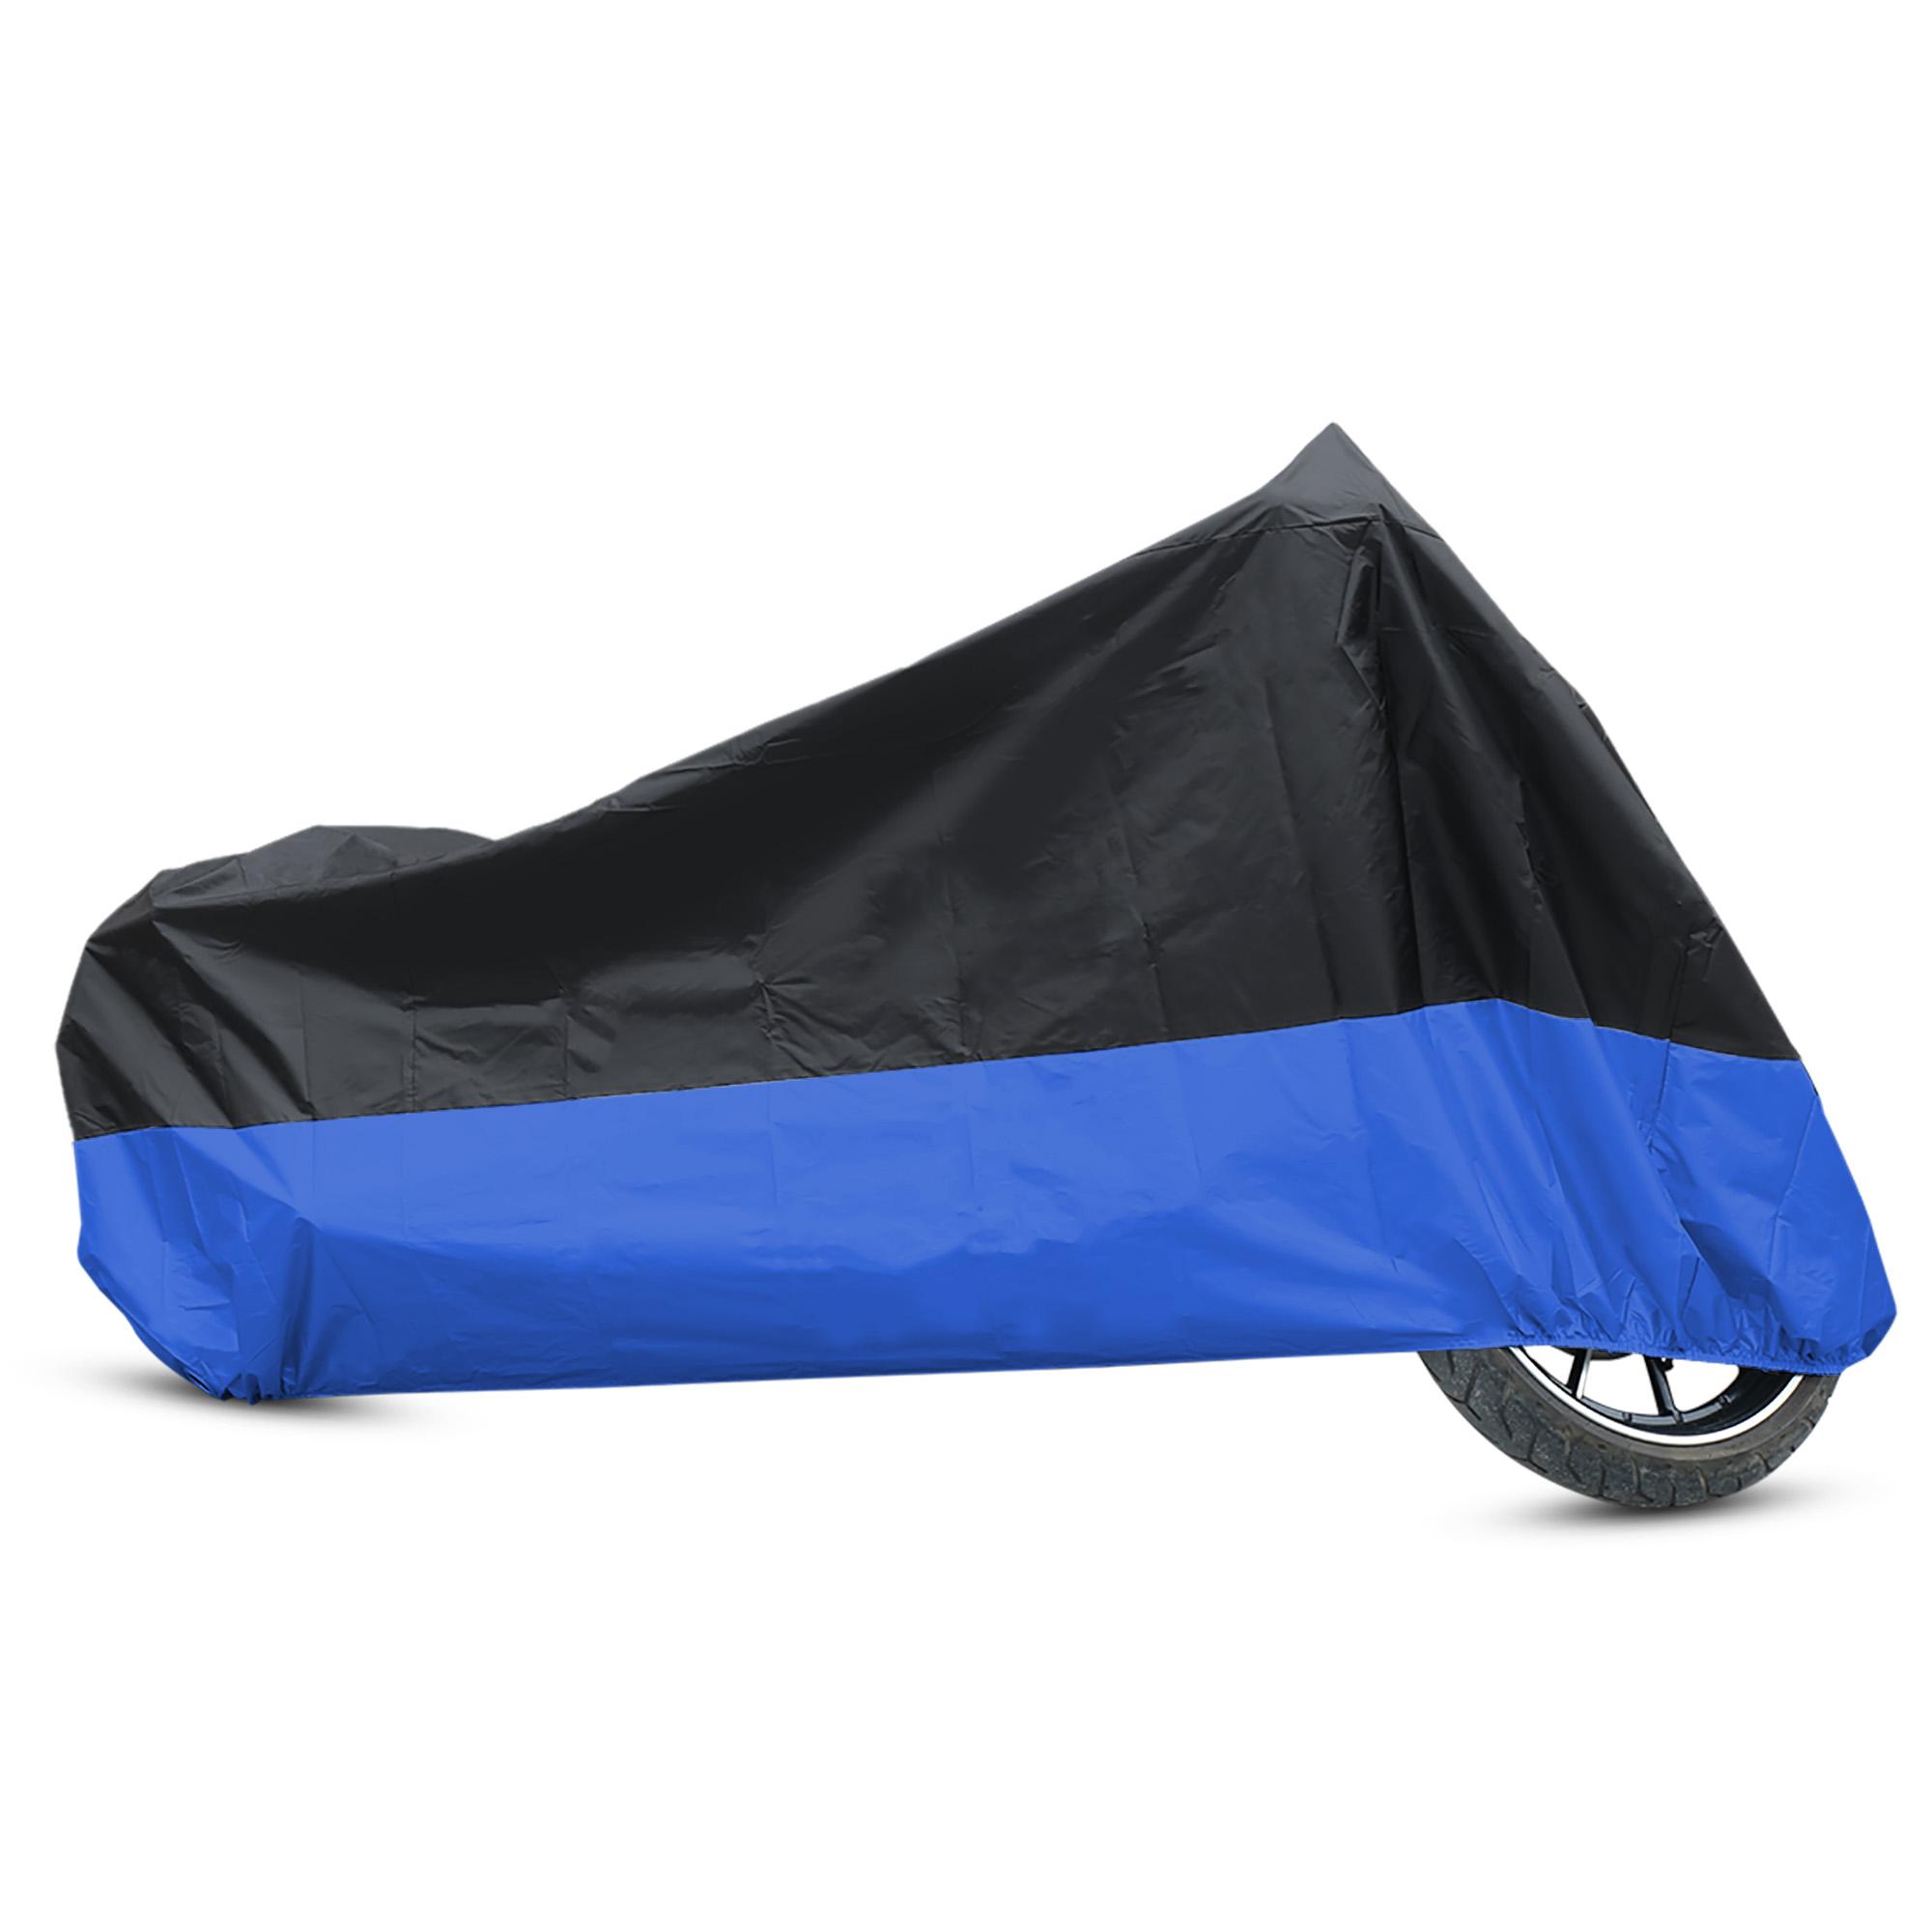 L 180T Rain Dust Motorcycle Cover Black+Blue Outdoor Waterproof UV Protector